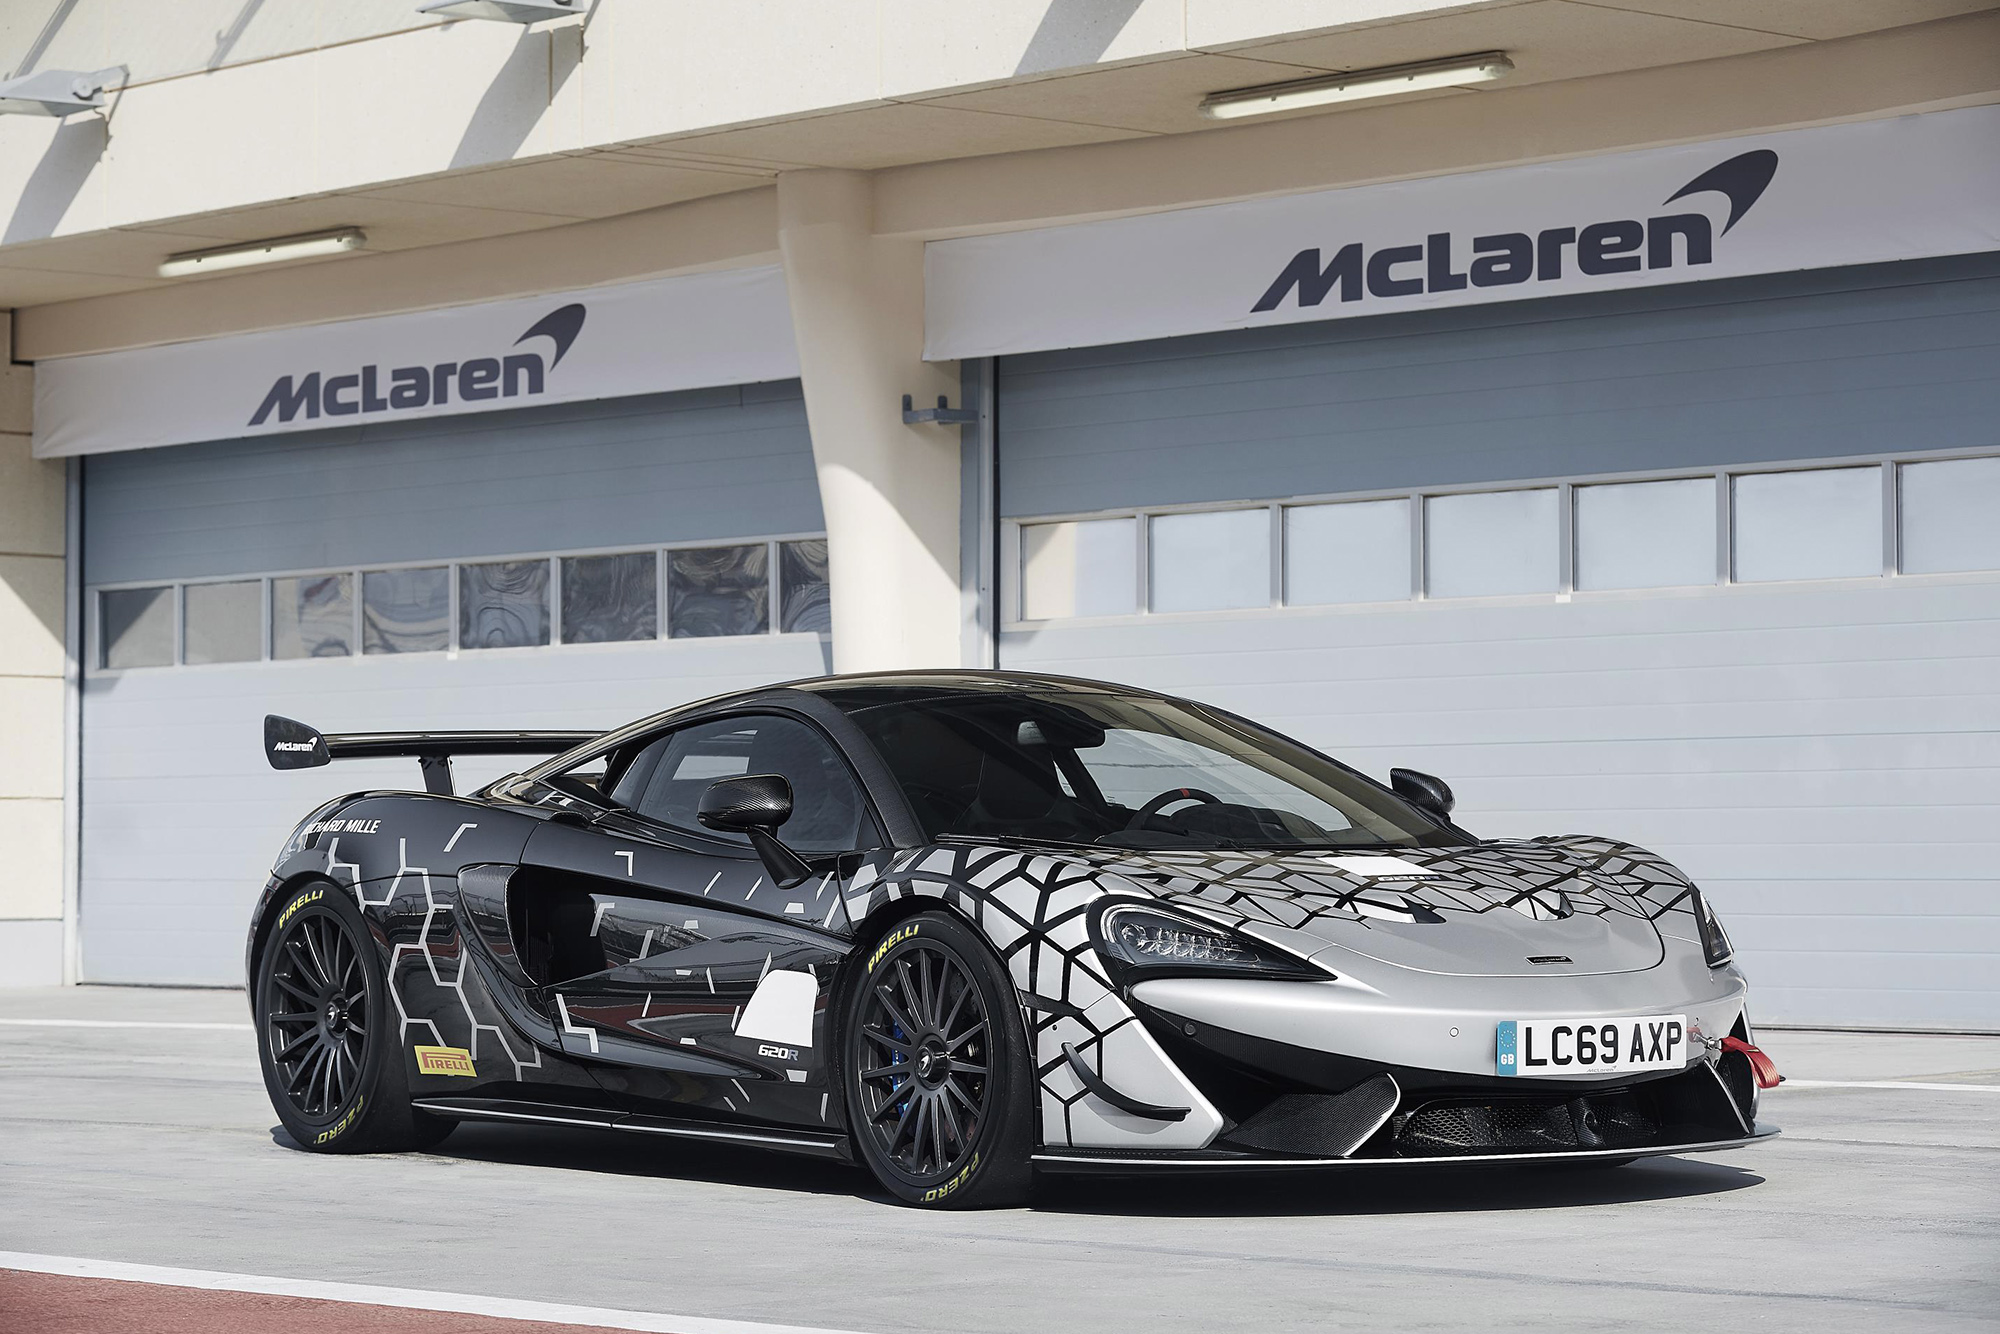 The McLaren 620R